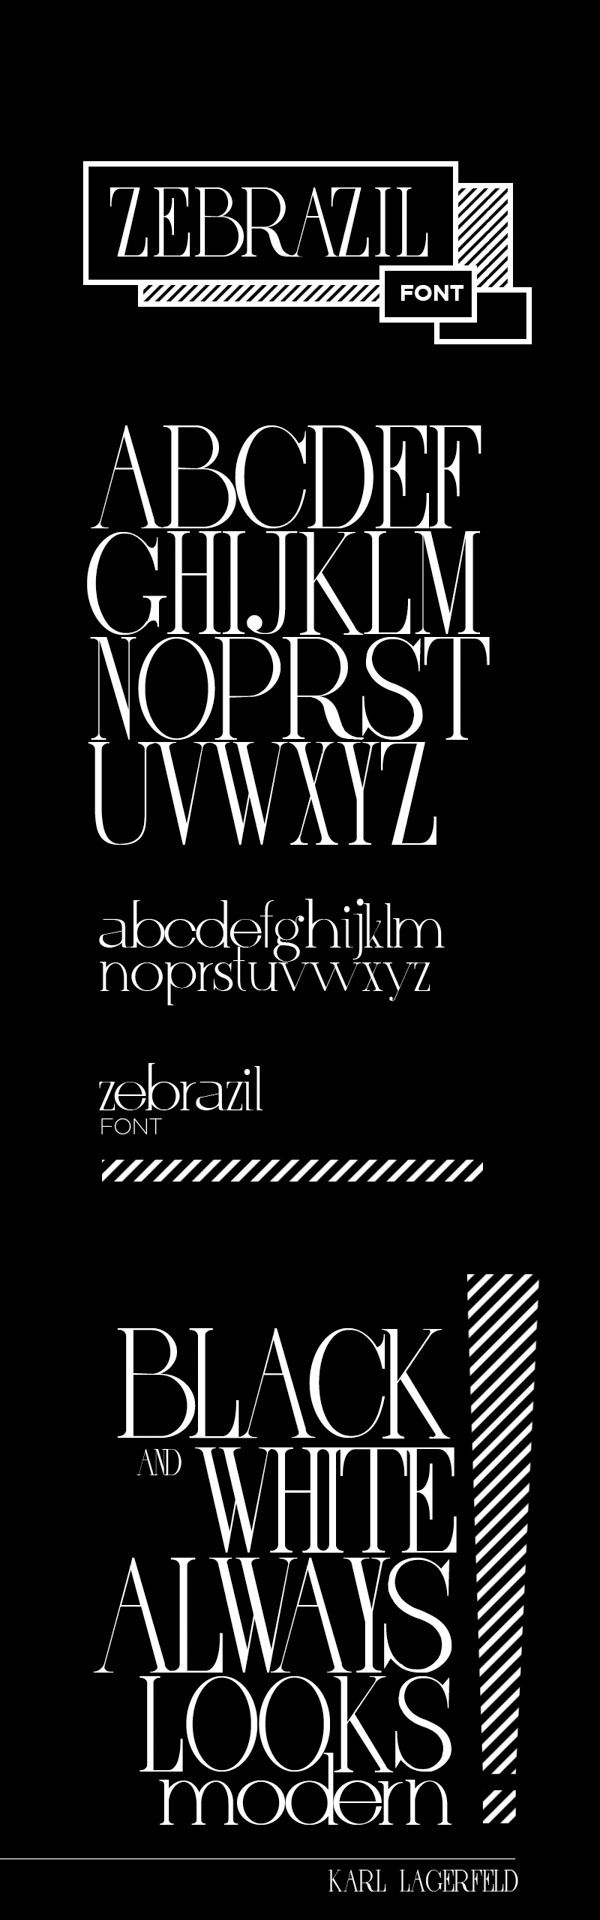 ZEBRAZIL - Free Font Great looking modern font